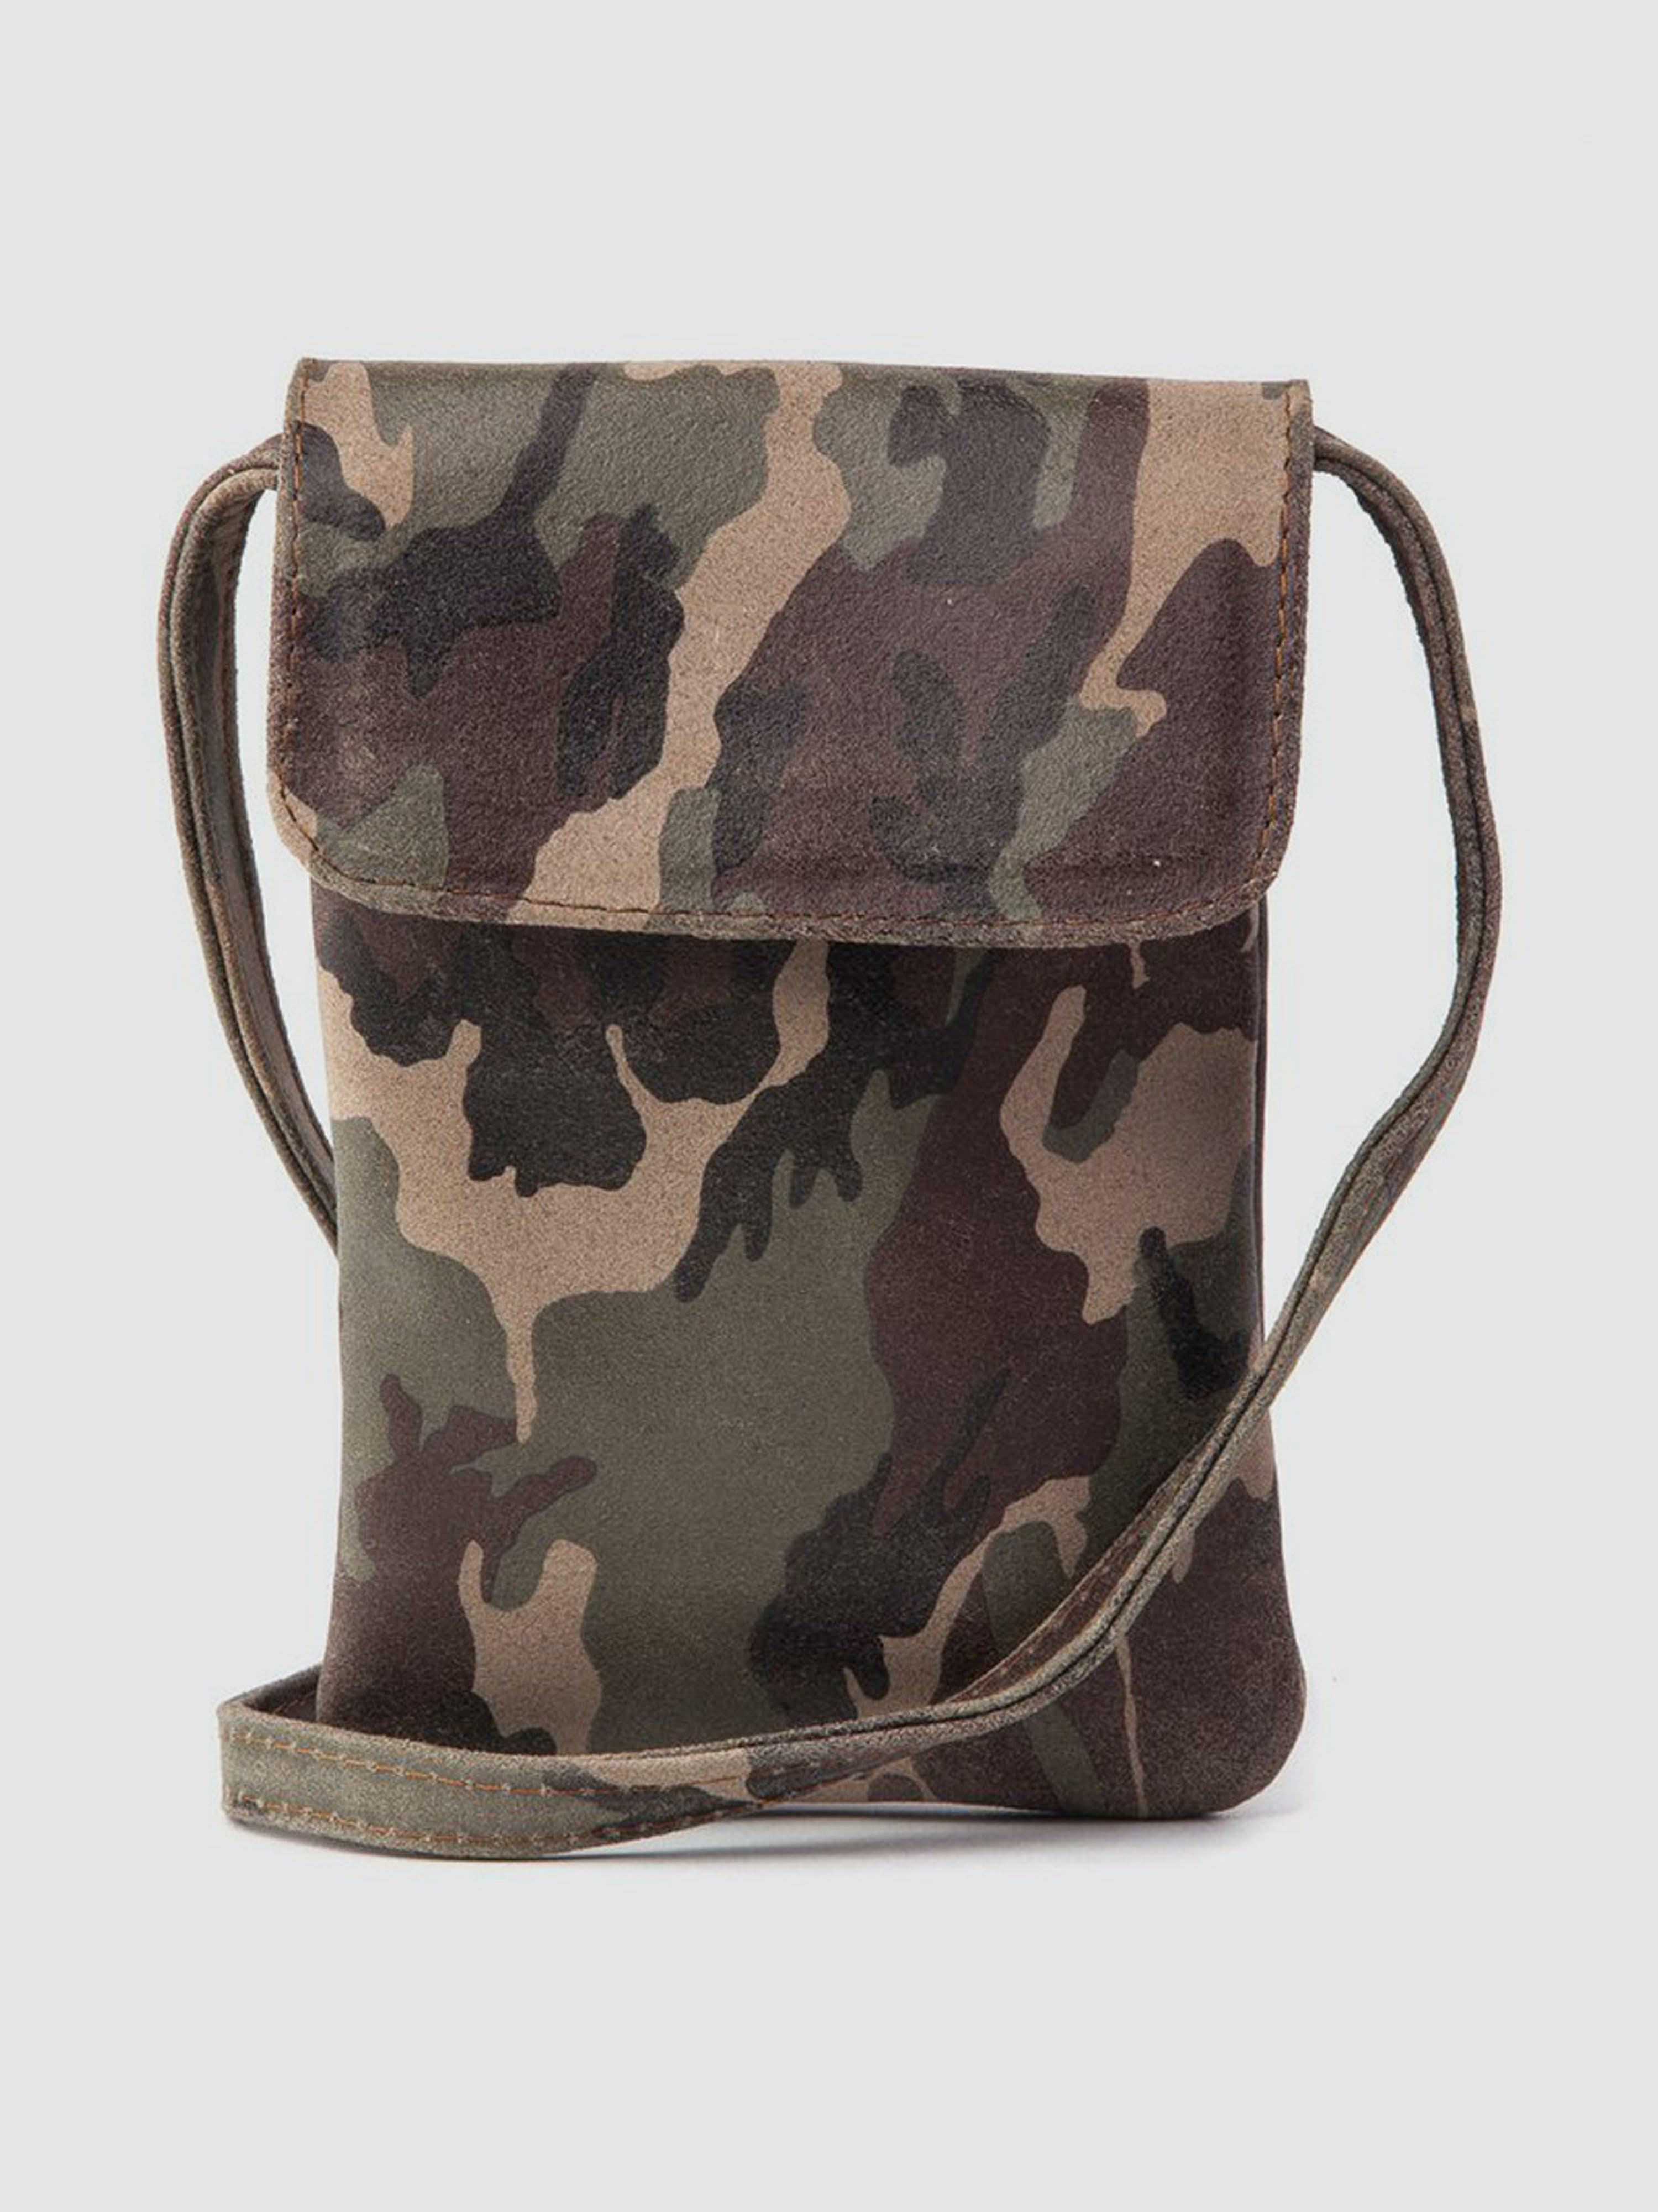 CoFi Leathers Penny Phone Bag: New Camouflague  - Green